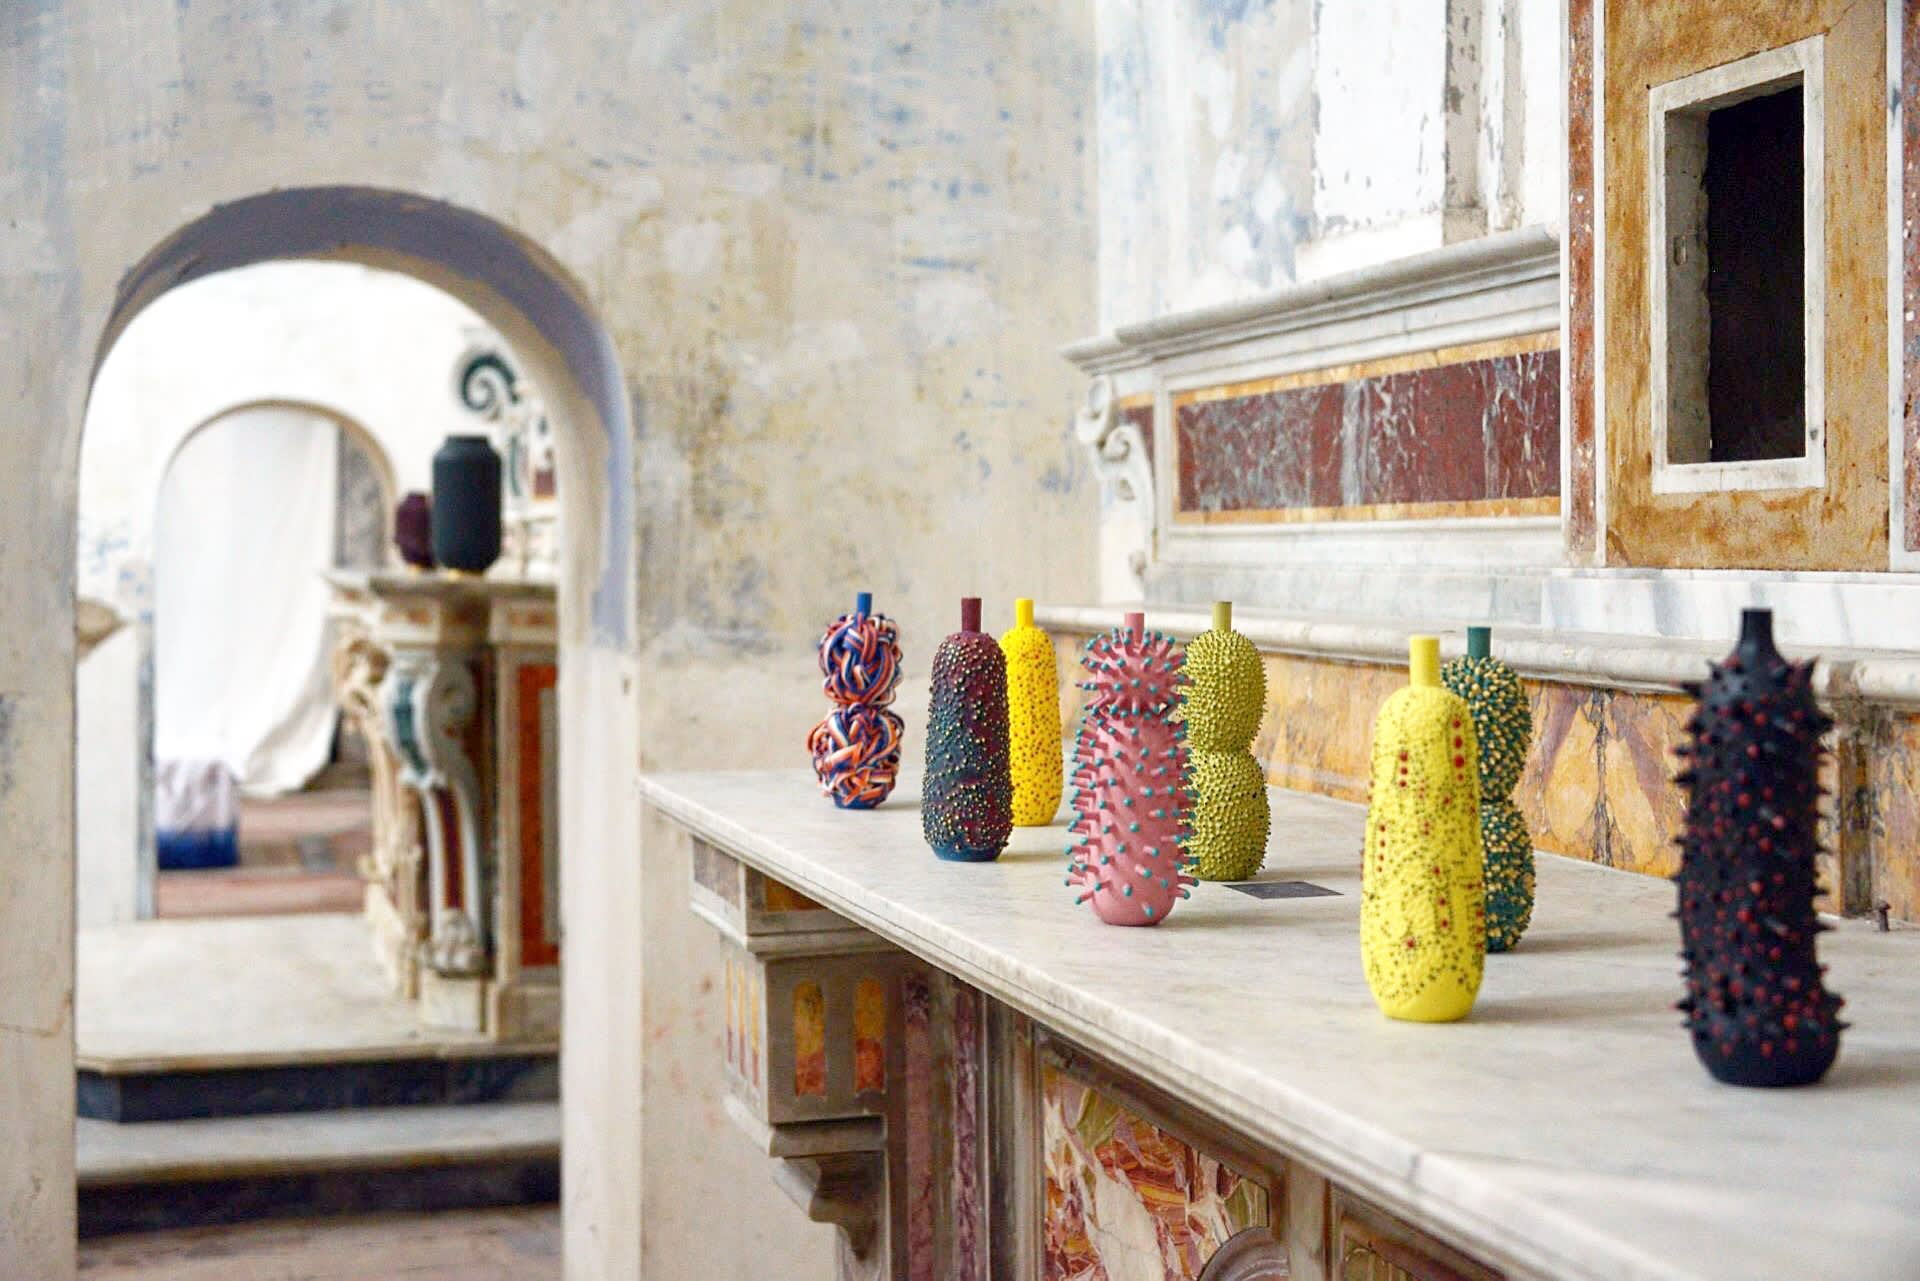 Vases & Vessels by Ahryun Lee seen at Chiesa di Santa Teresa, Benevento - MATERIALIA, 2017